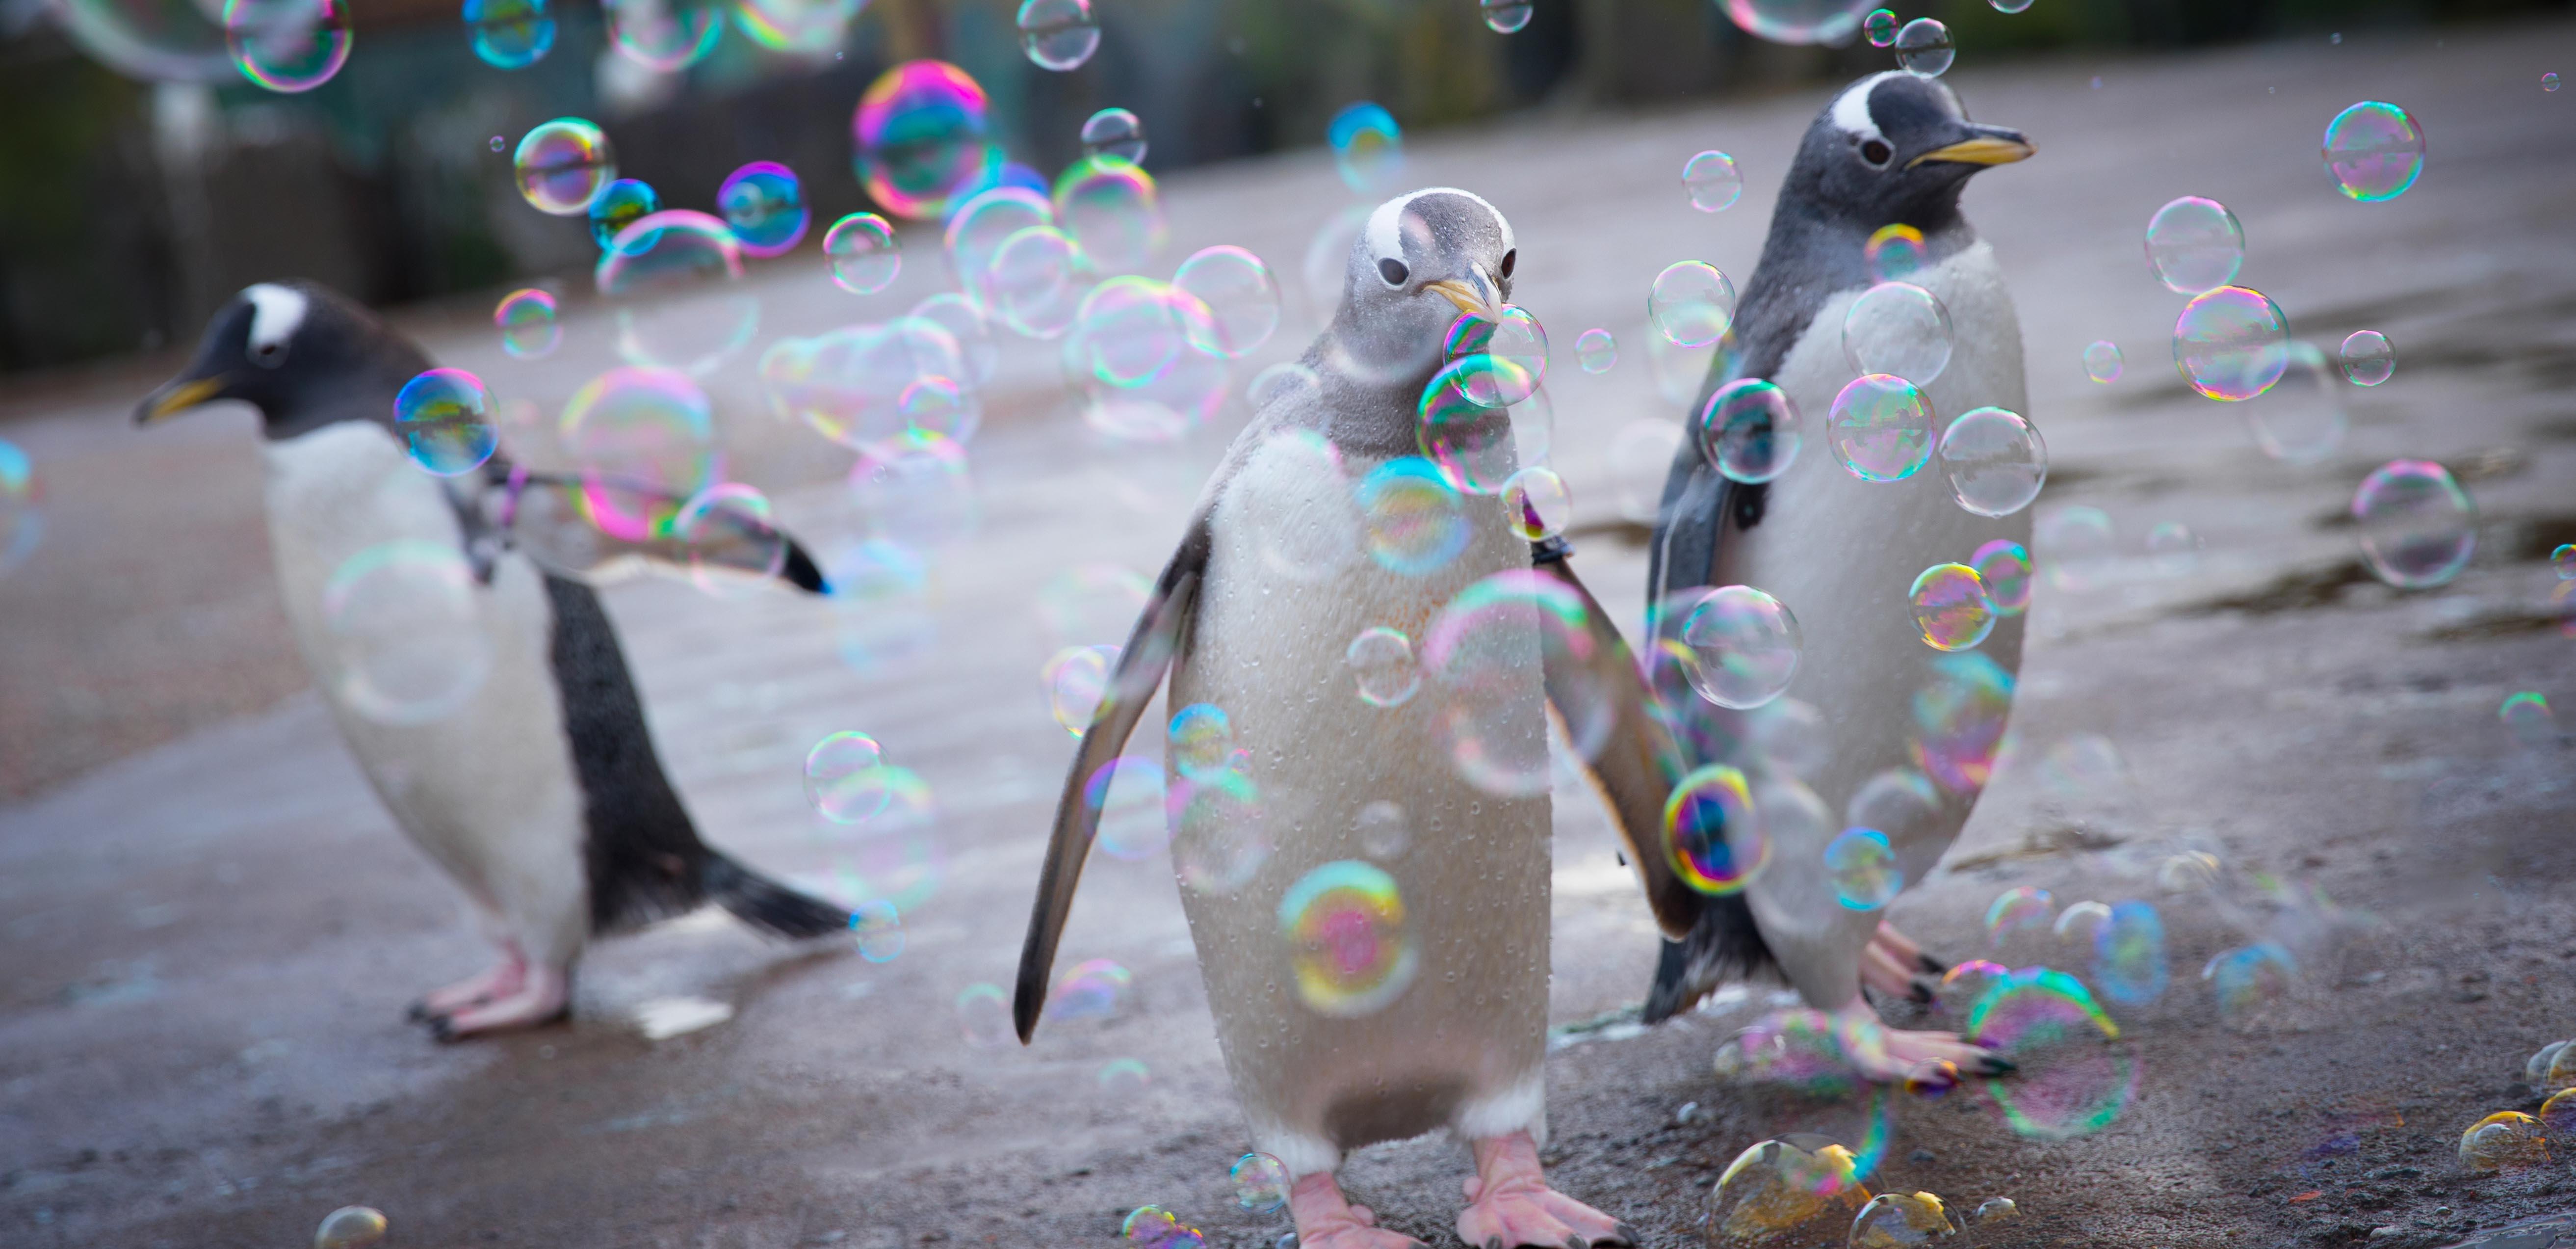 Penguin with leucism